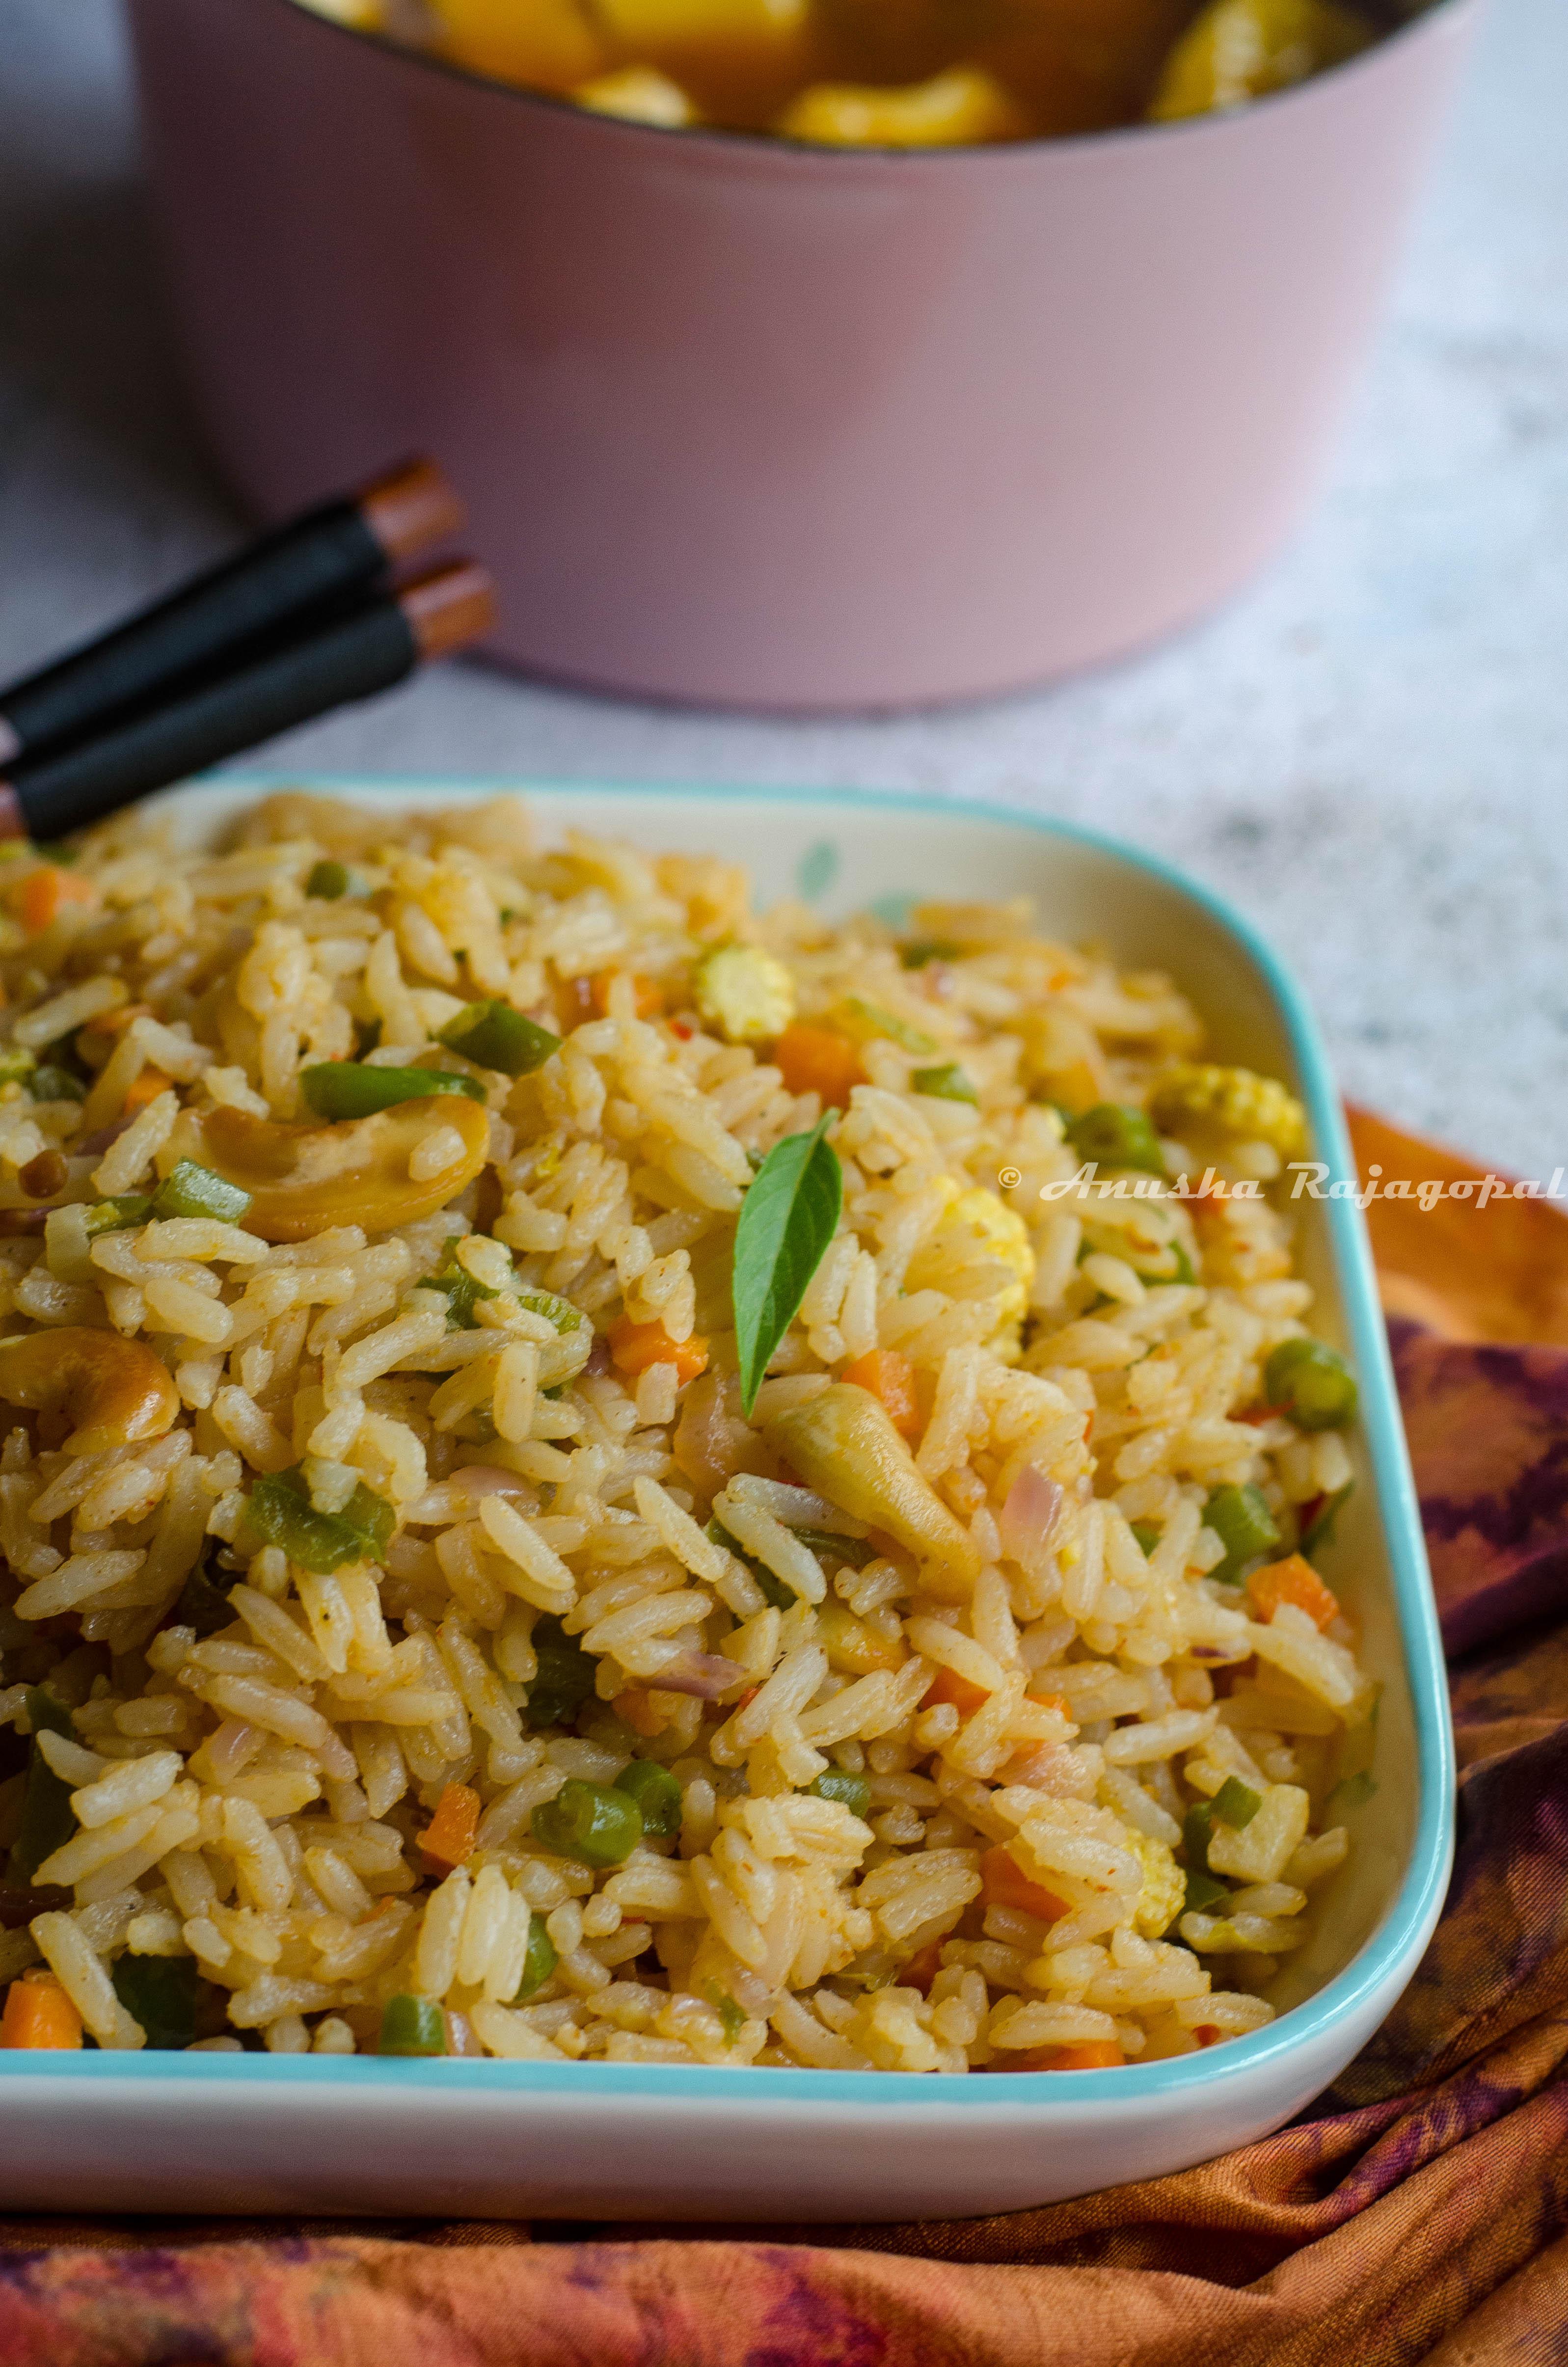 vegan thai basil fried rice served in a white platter placed on a tye dye napkin